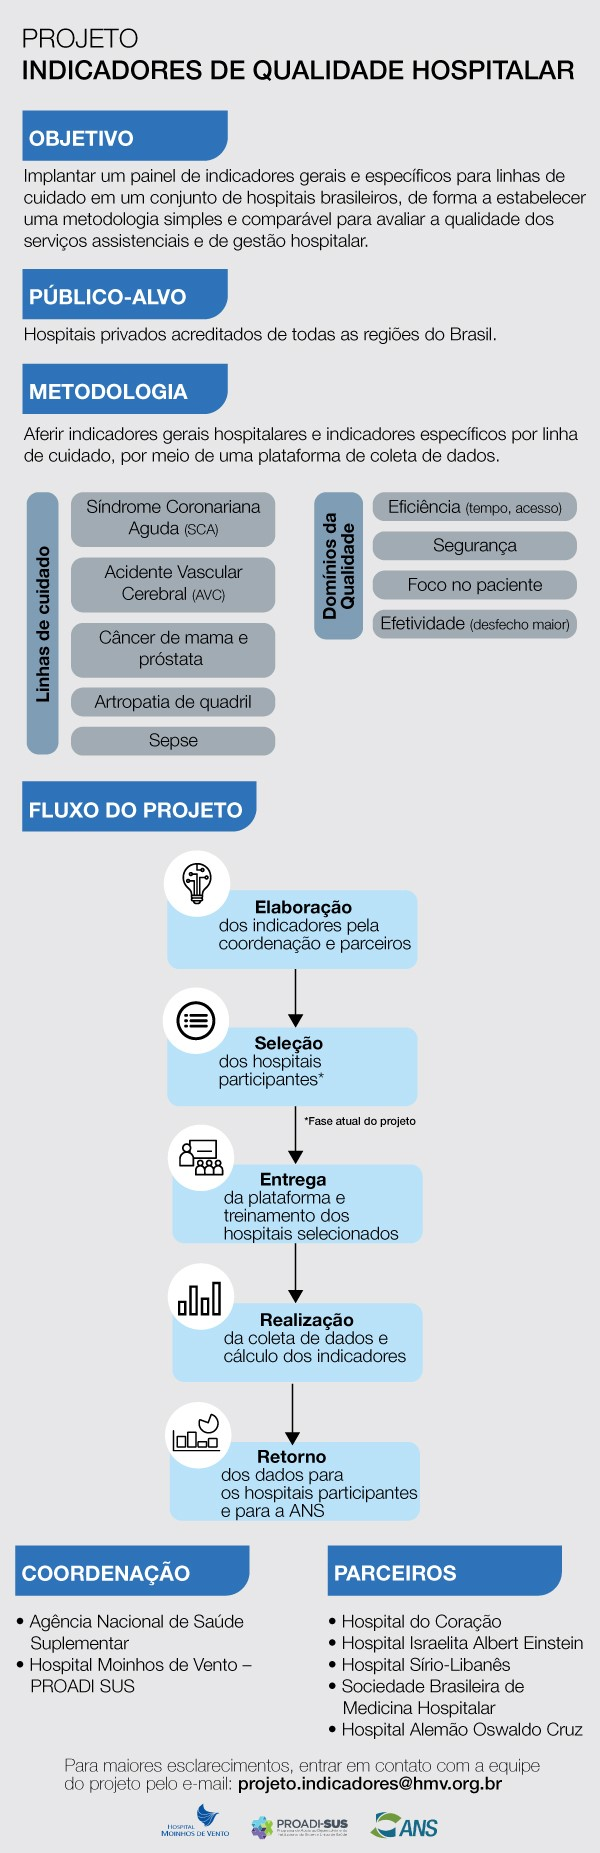 projeto_indicadores.jpg